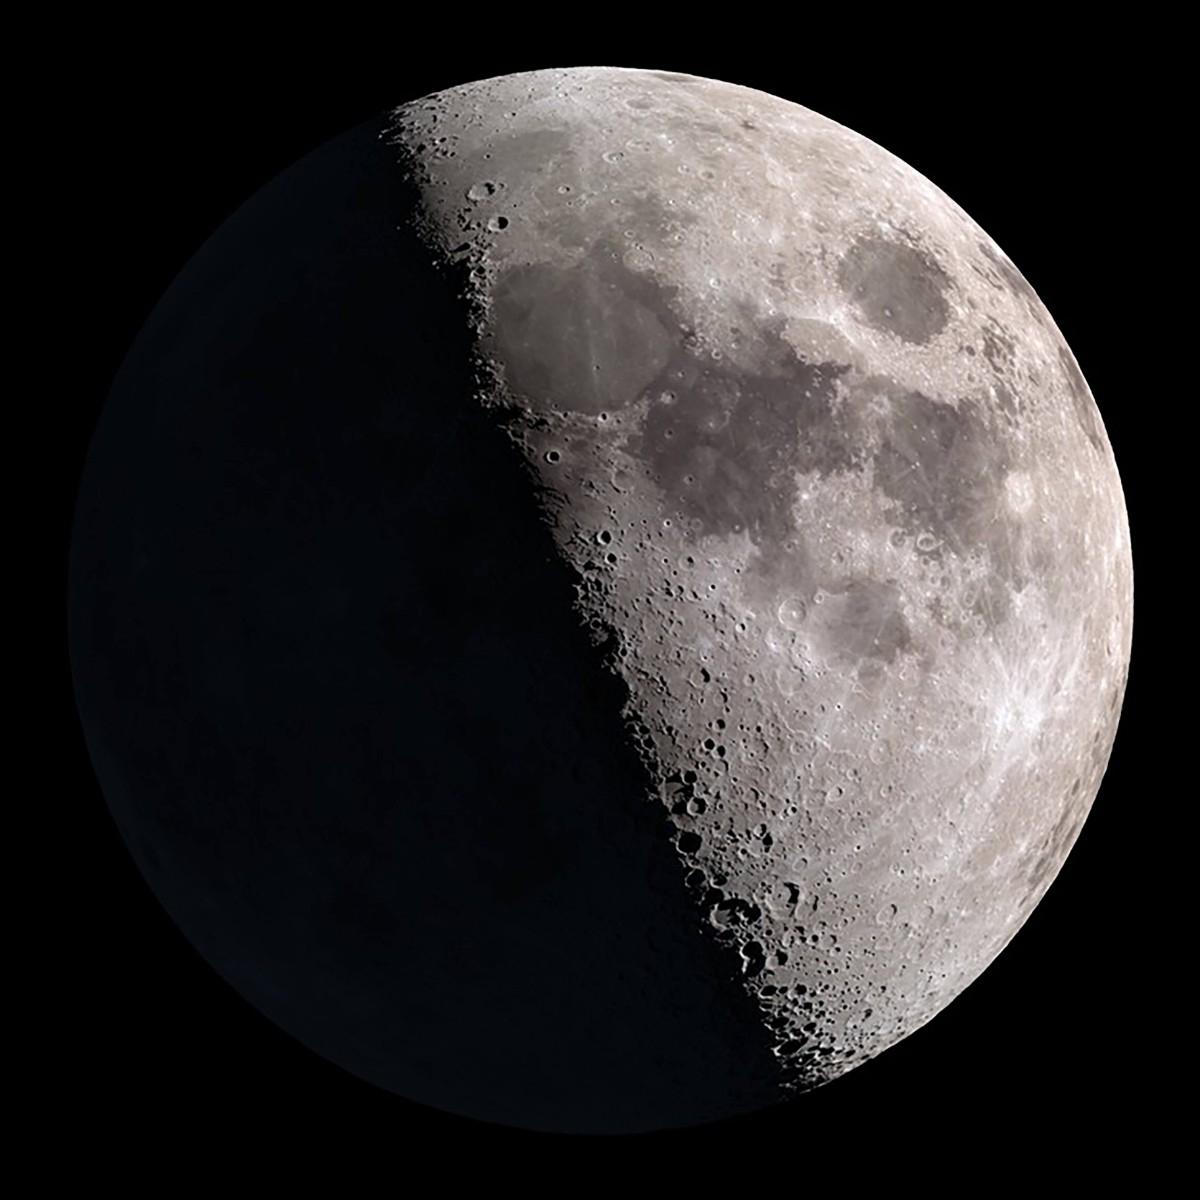 Ramadan 2017: Why Is It So Important For Muslims? | Ramadan 2017 regarding Moon July 21 Day Malayalam